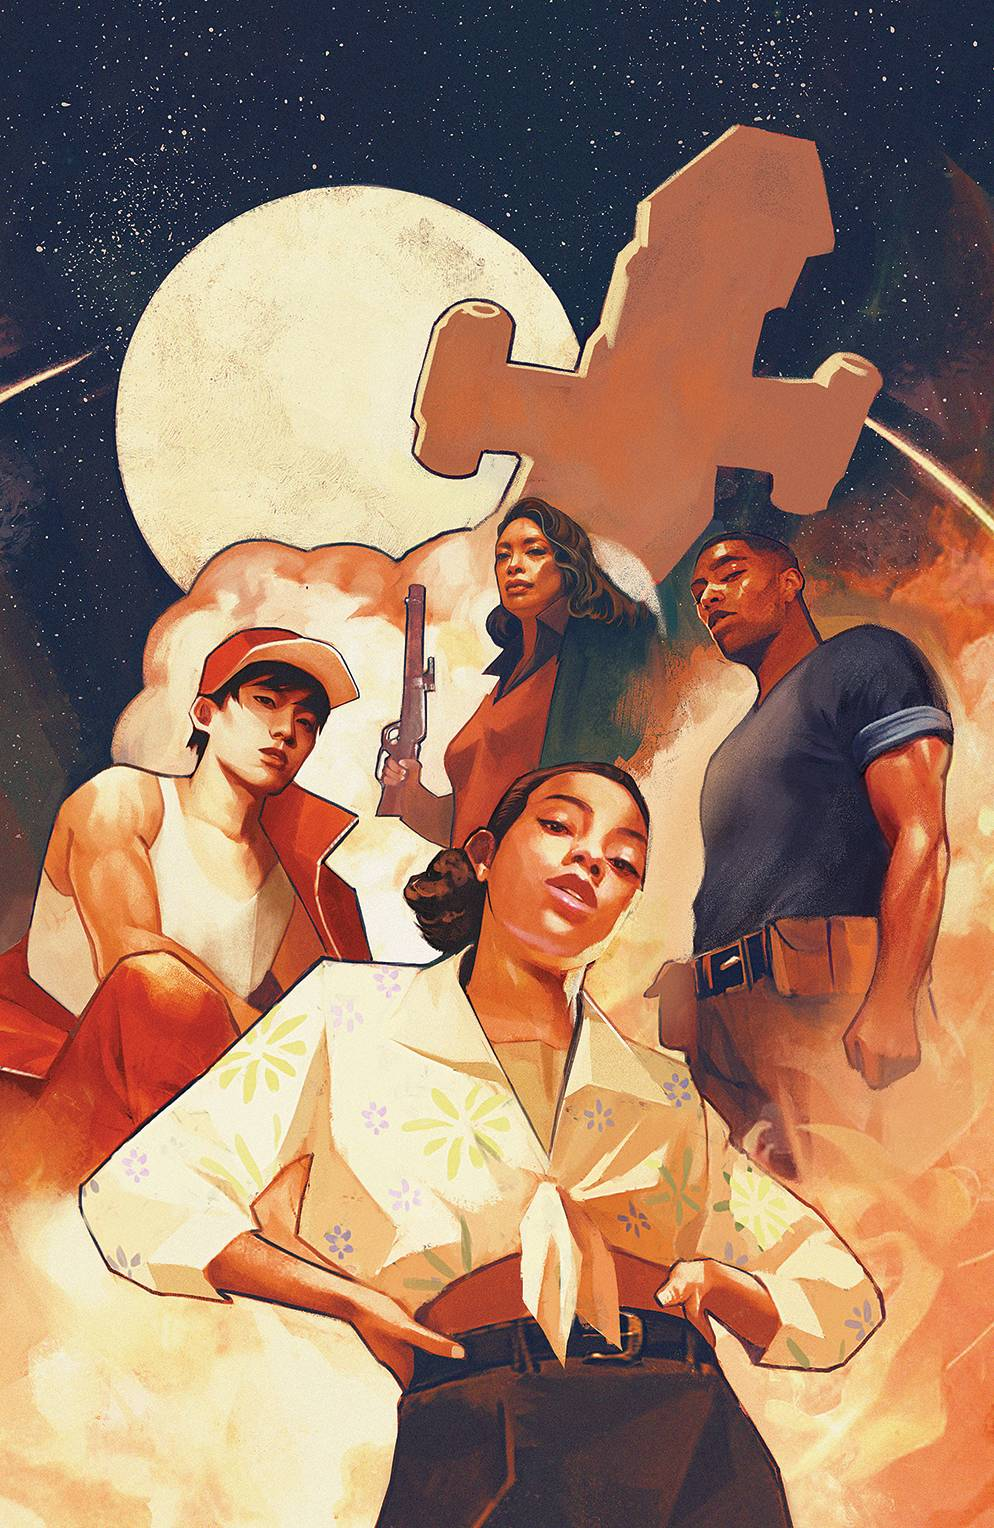 STL186494 ComicList: BOOM! Studios New Releases for 03/24/2021